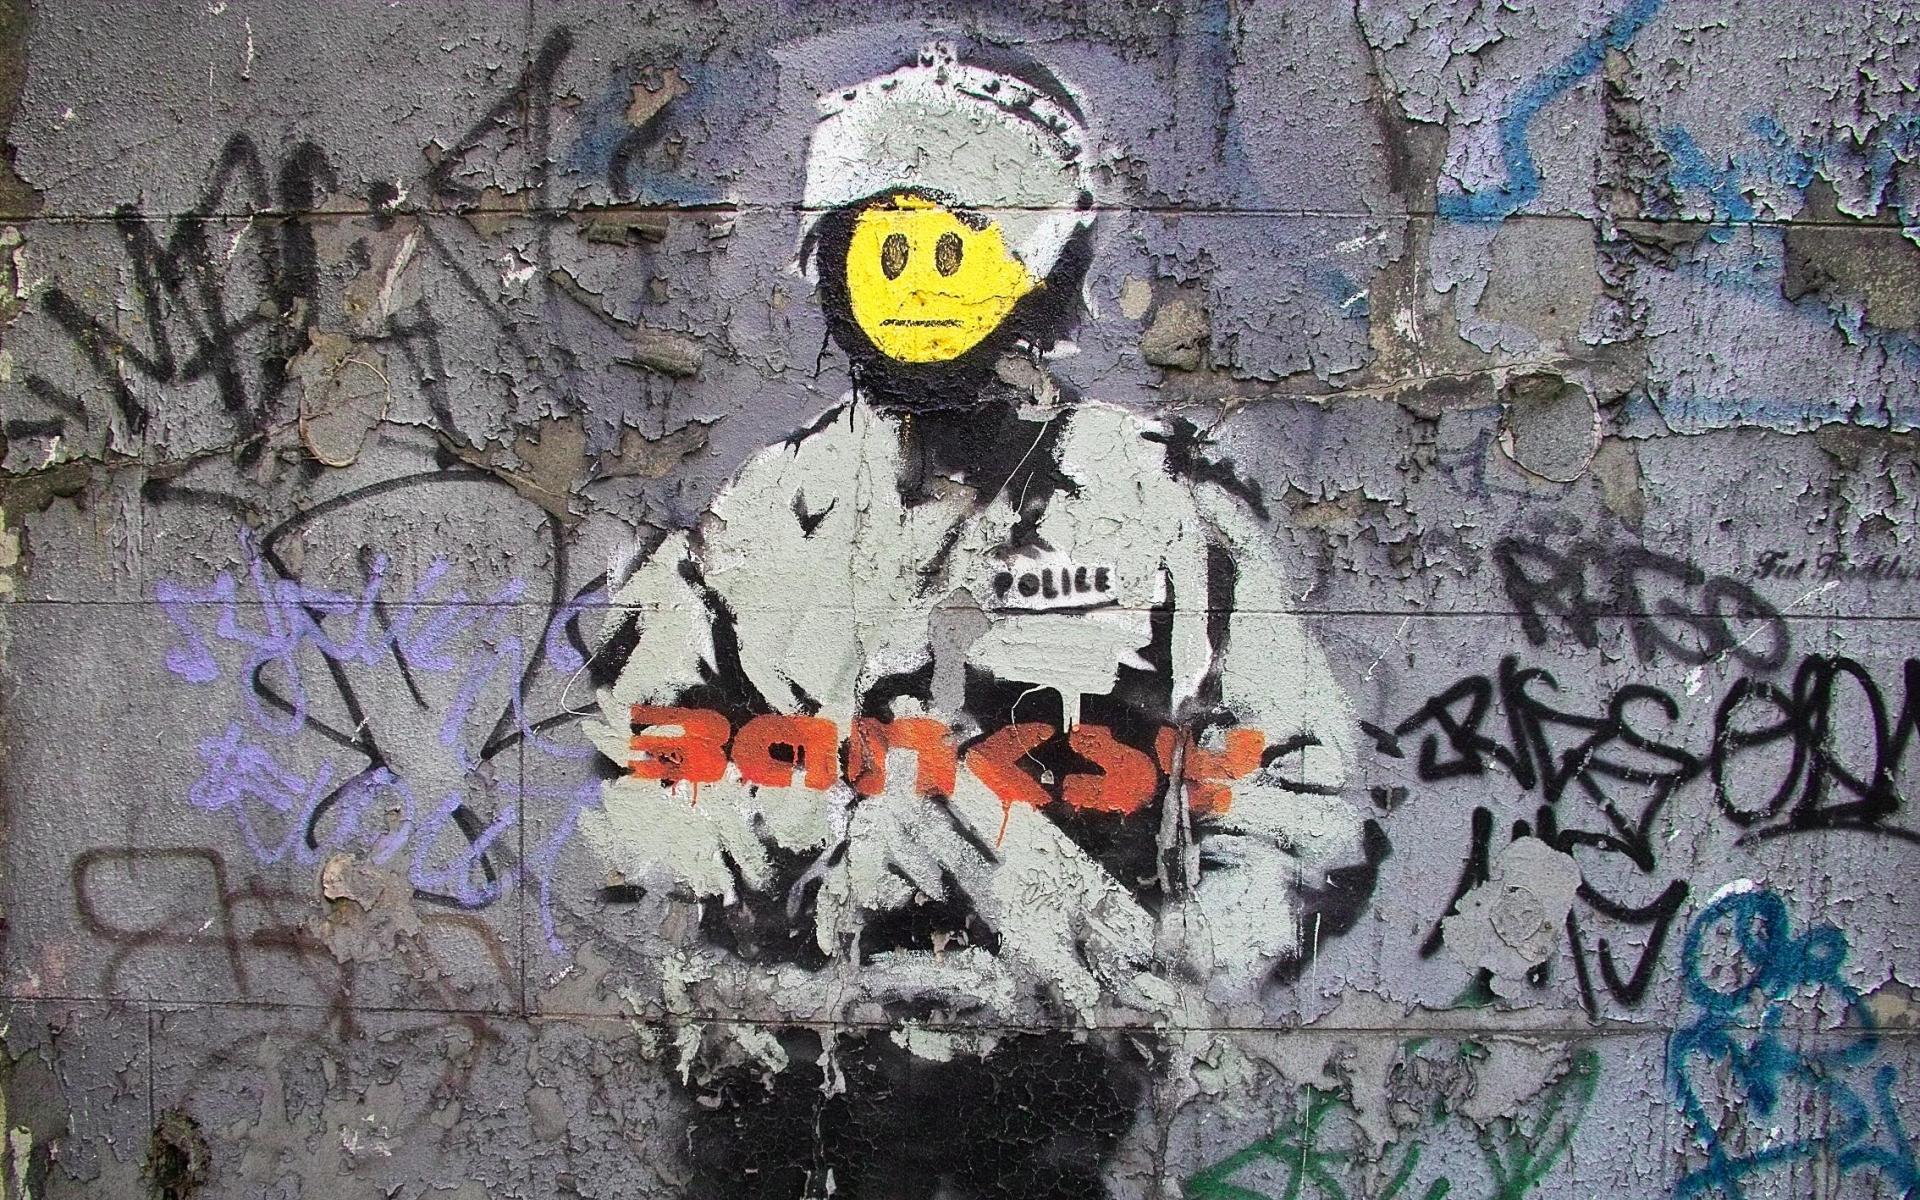 3d Street Art Graffiti Wallpaper Graffiti Full Hd Wallpaper And Background Image